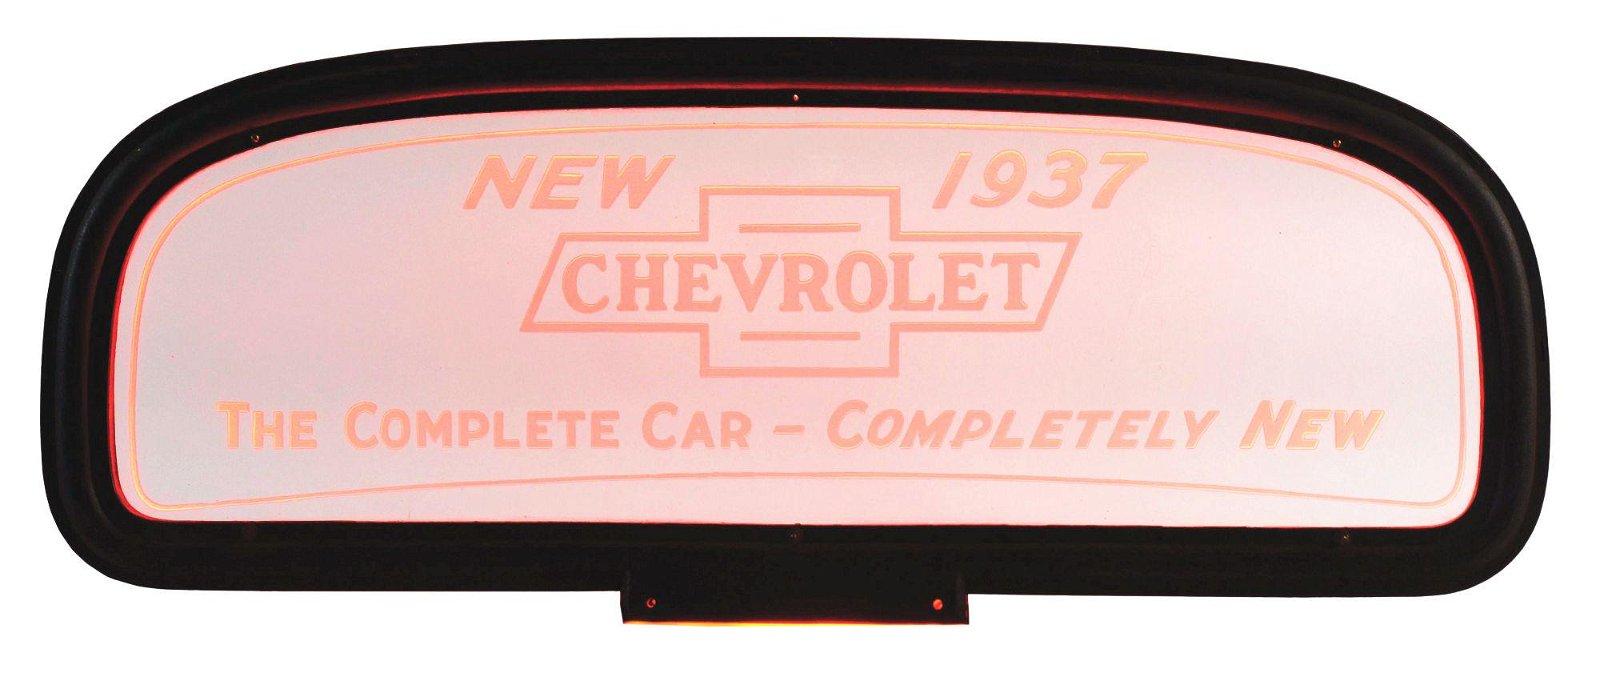 Rare 1937 Chevrolet Neon Glass Dealership Window